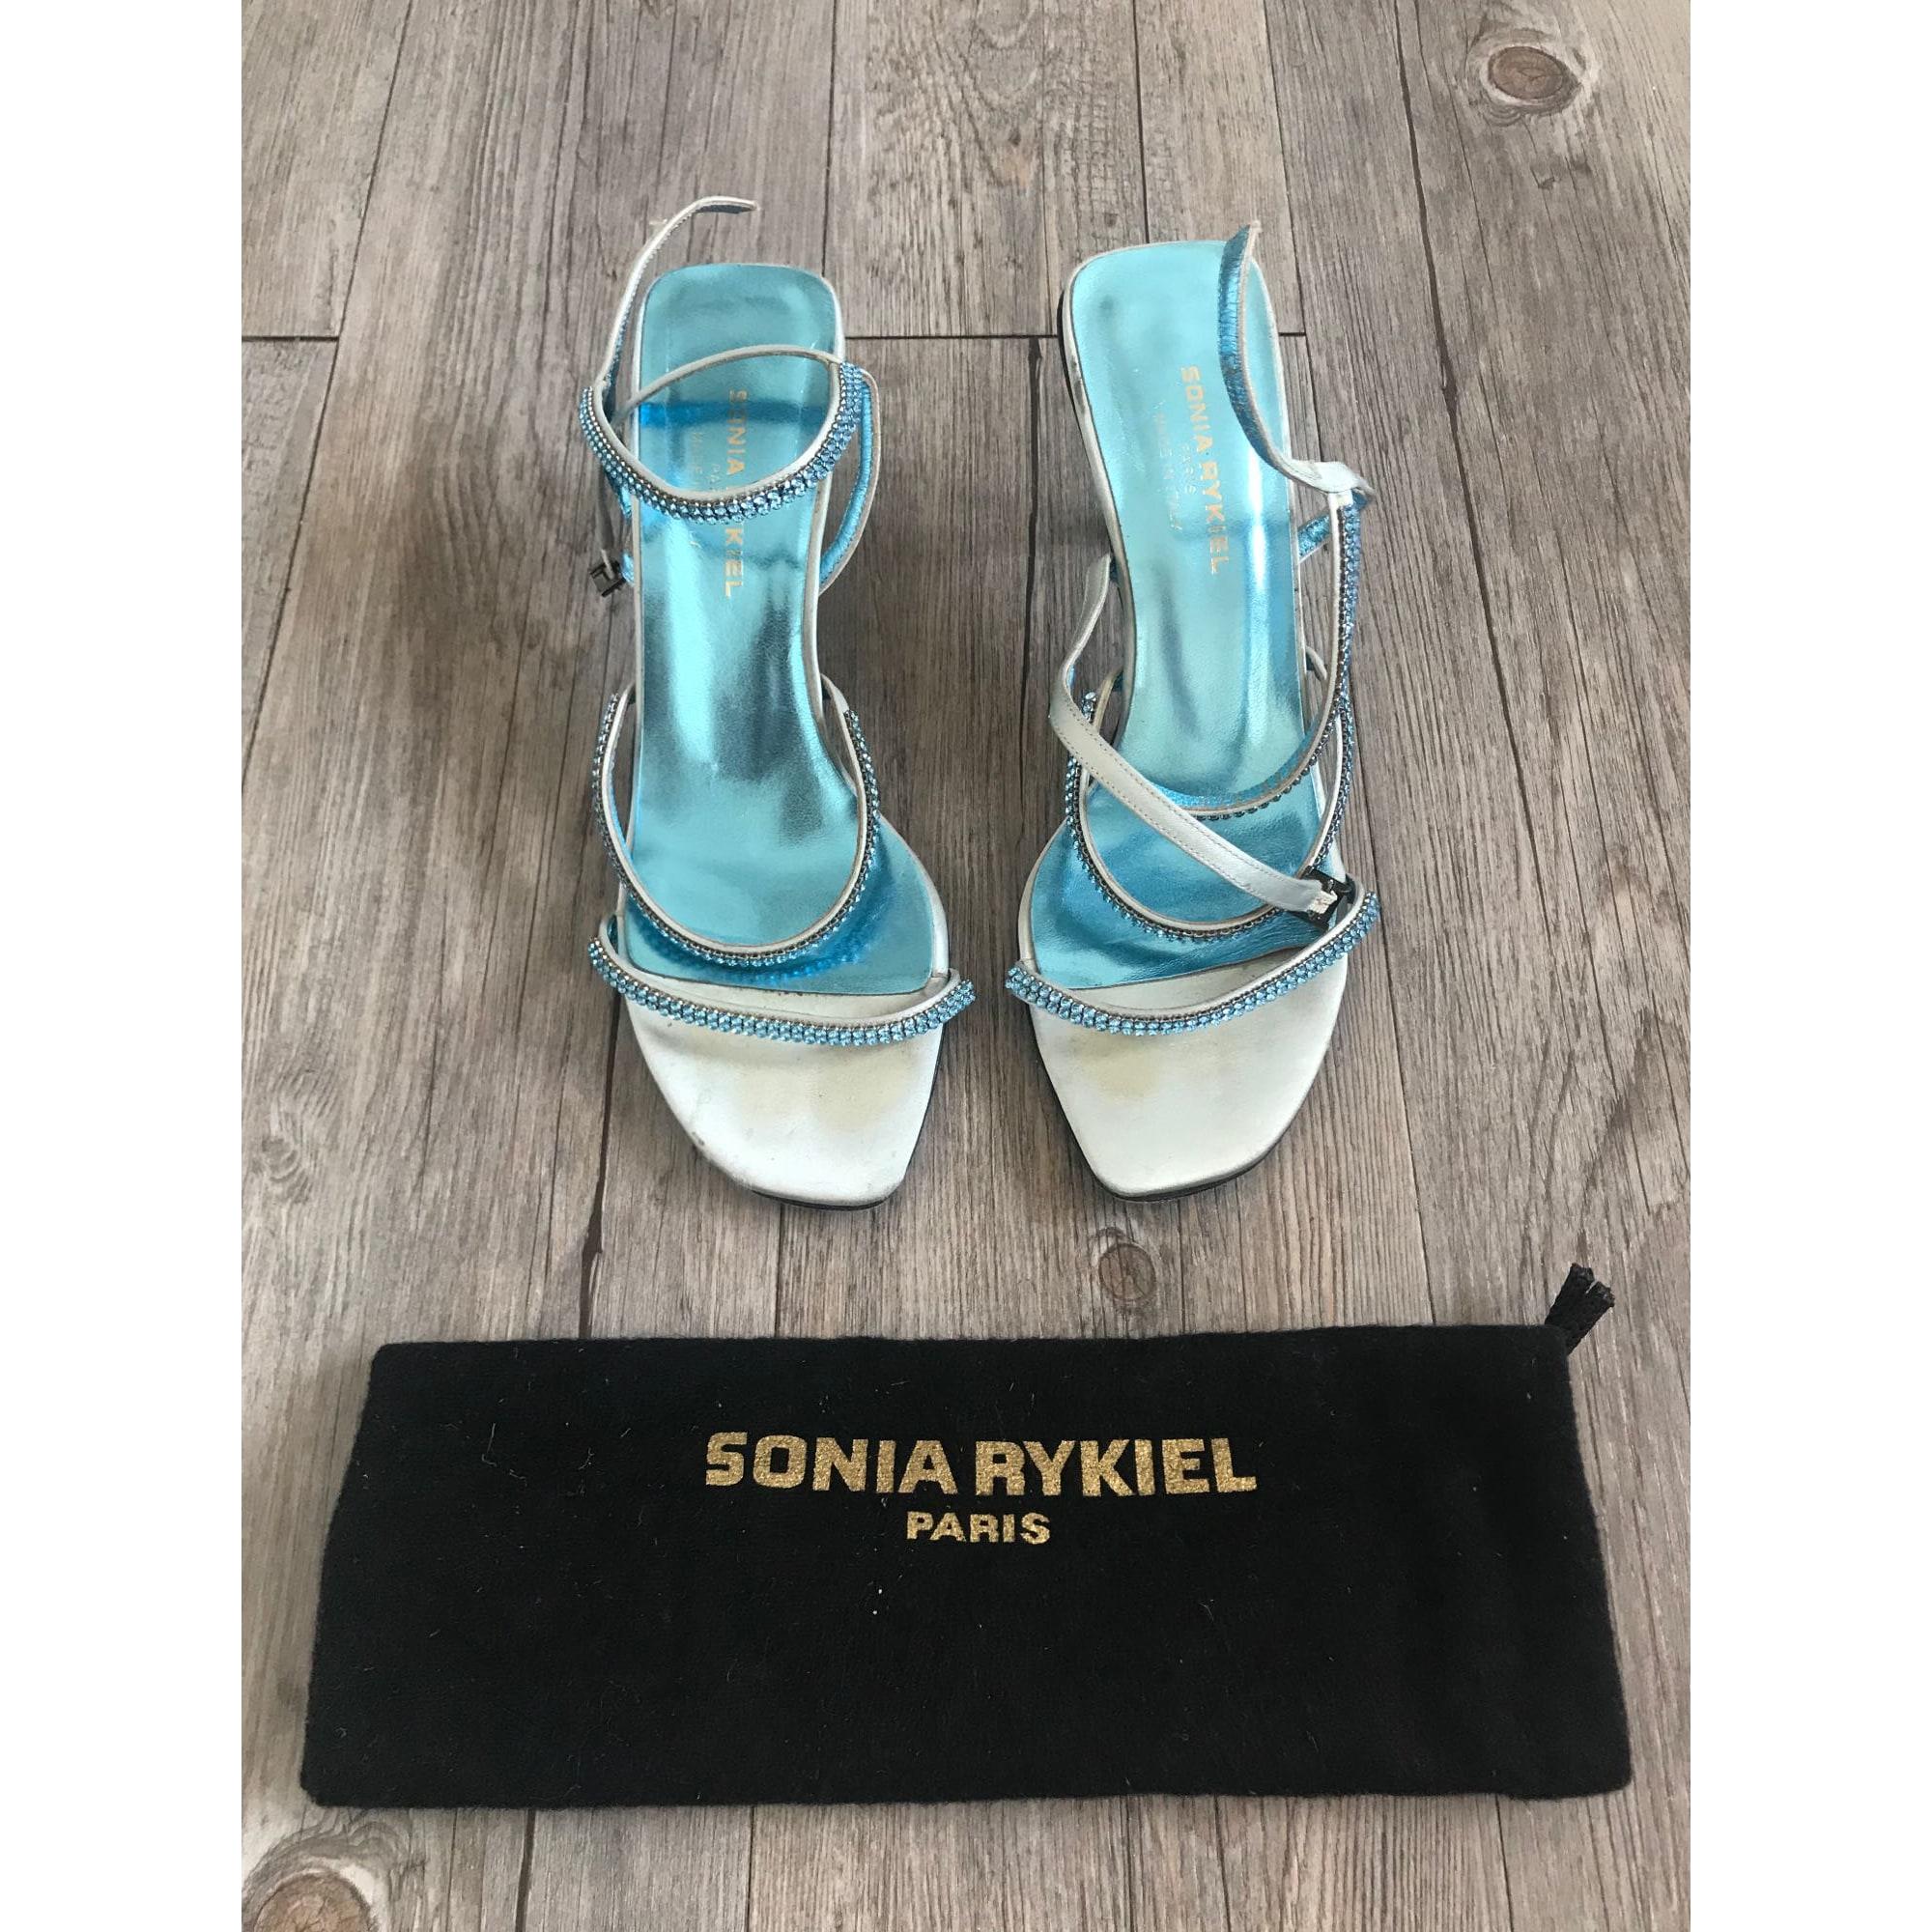 Sandales à talons SONIA RYKIEL Bleu, bleu marine, bleu turquoise